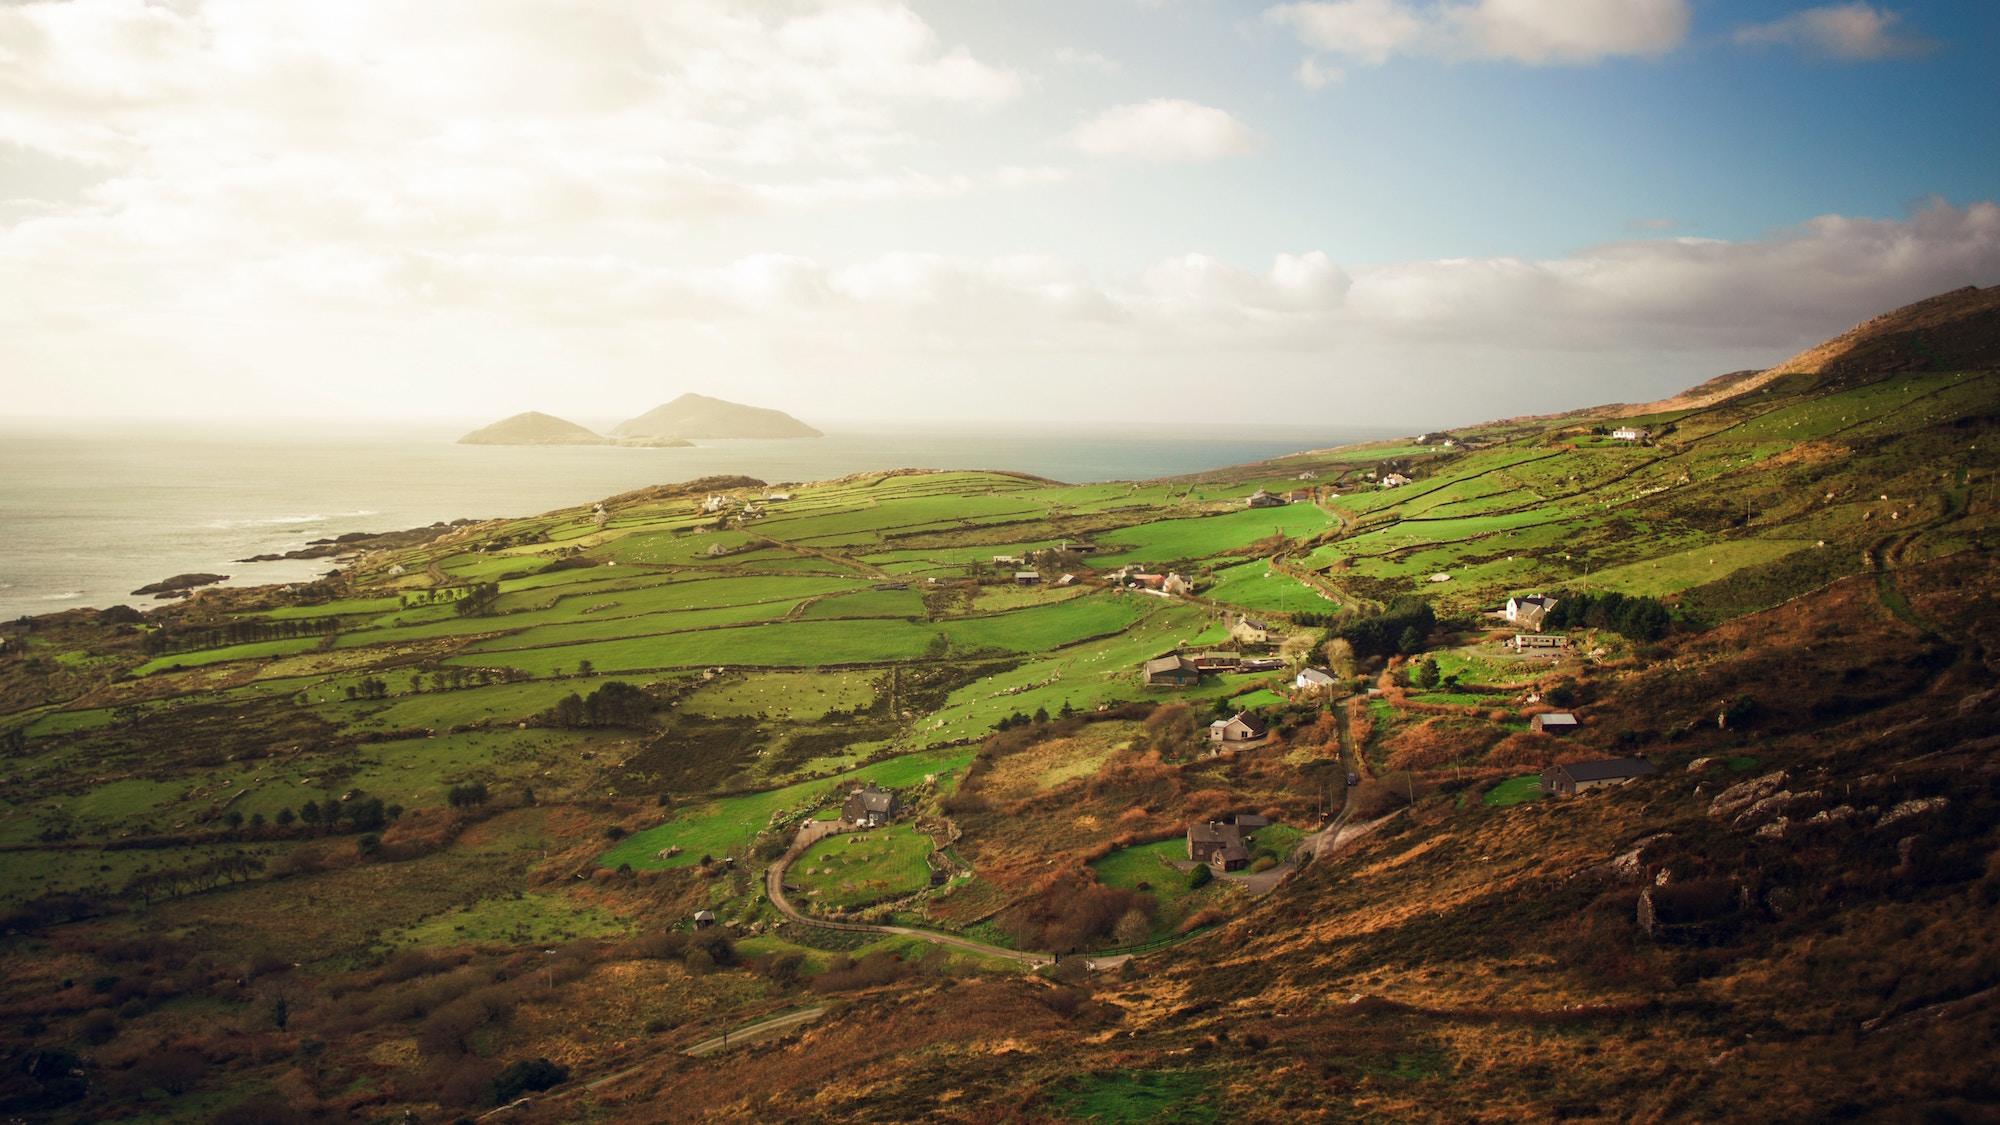 redhead-round-the-world-blogger-ireland-destinations-fields-green-water-light.jpg